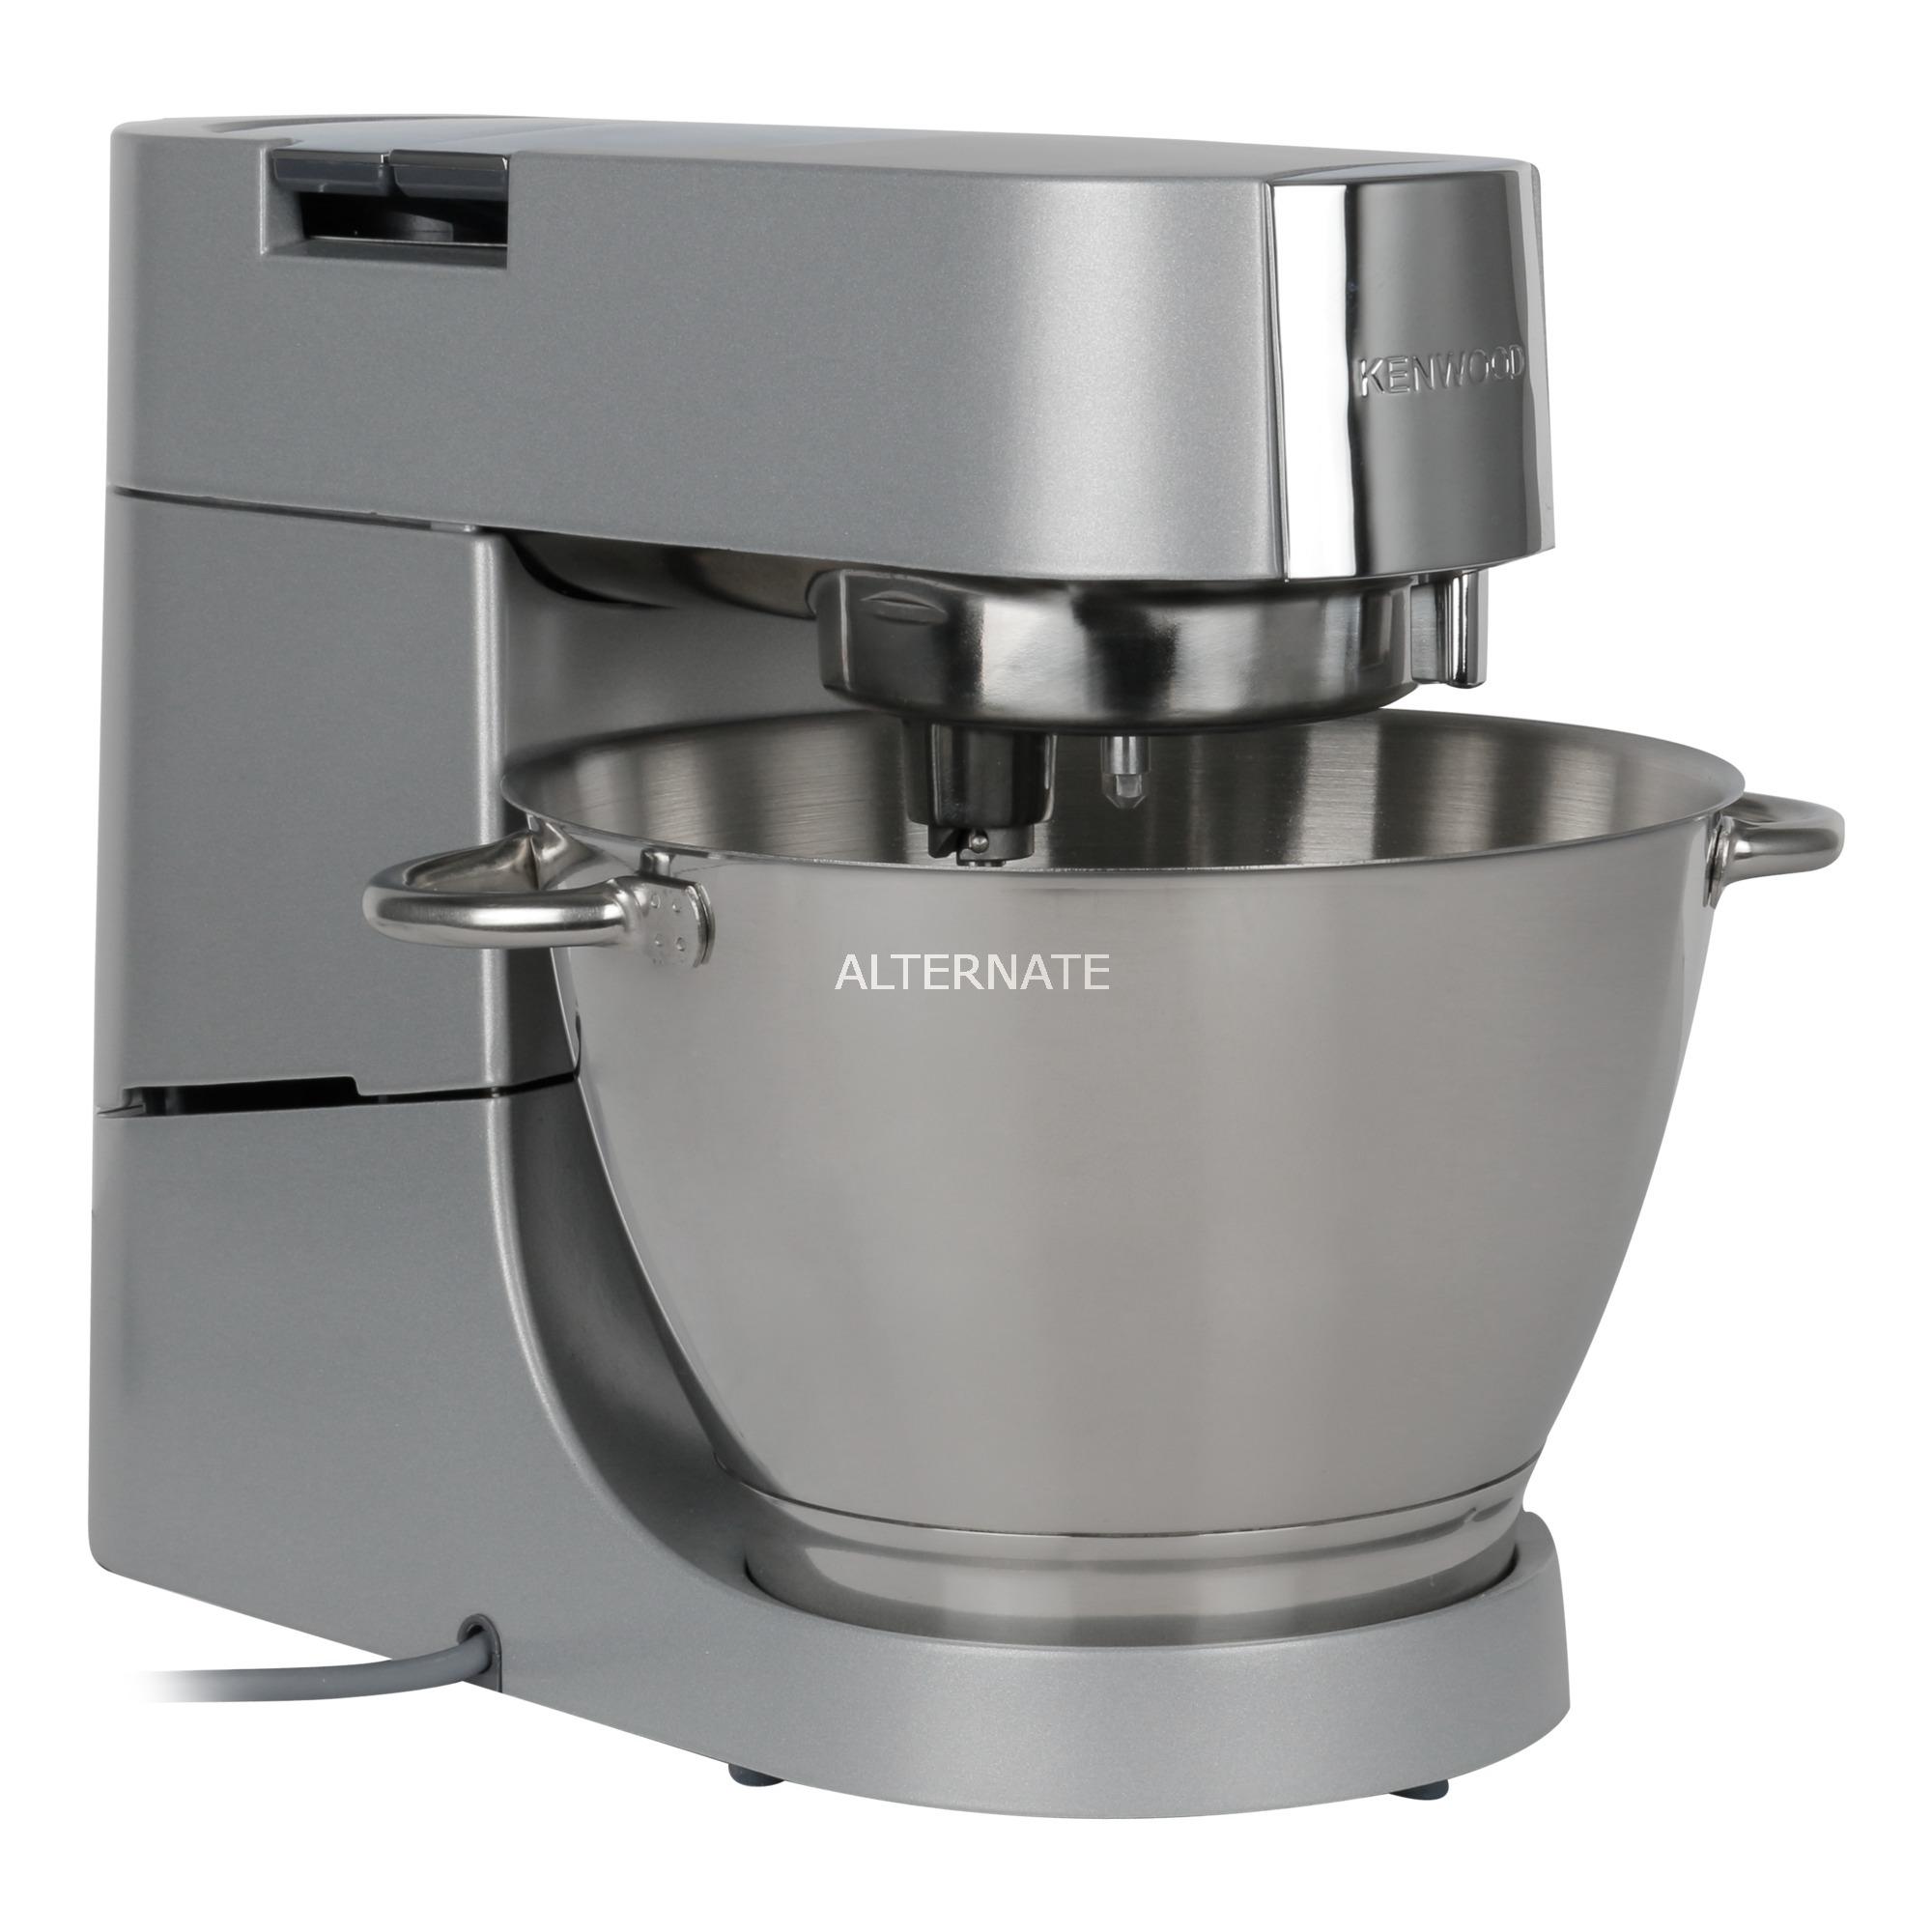 Kenwood KMC070 robot da cucina 4,6 L Argento 1400 W accaio, 4,6 L ...